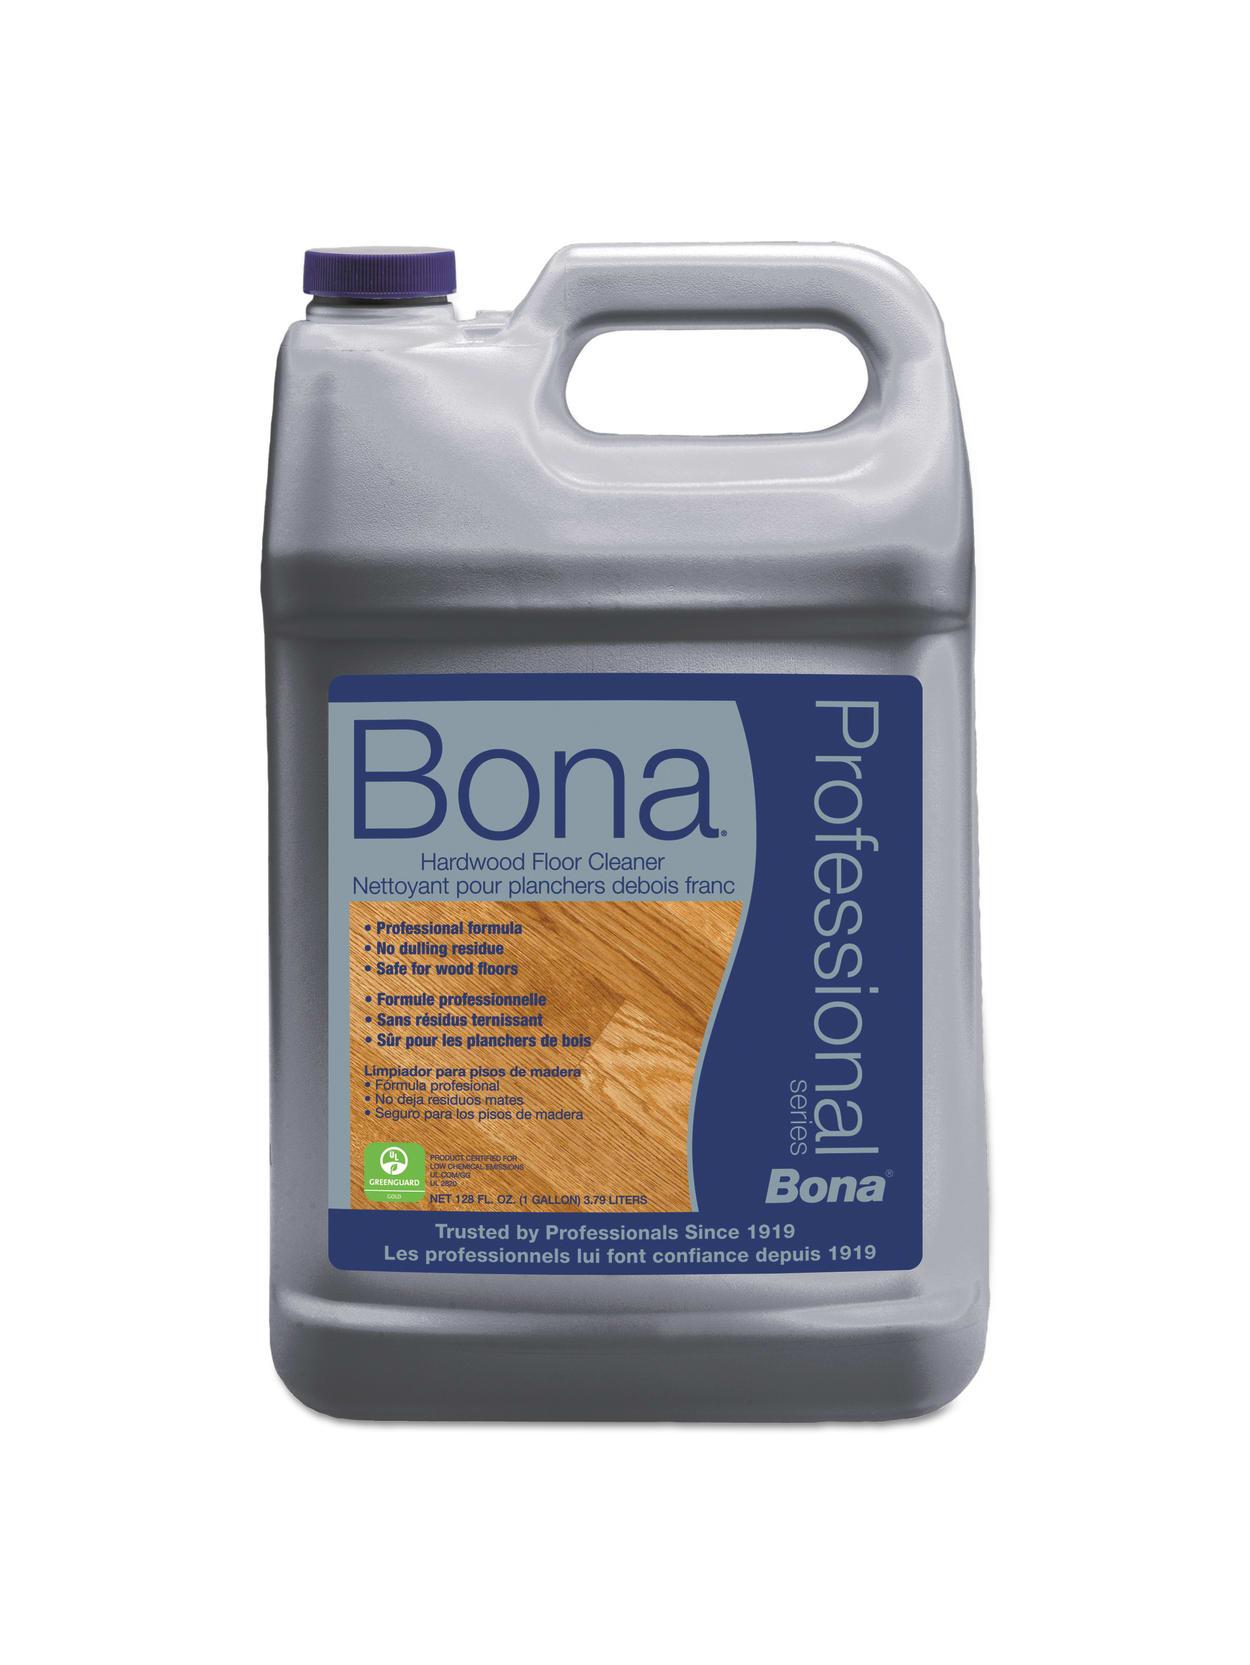 Bona Hardwood Floor Cleaner 128 Oz